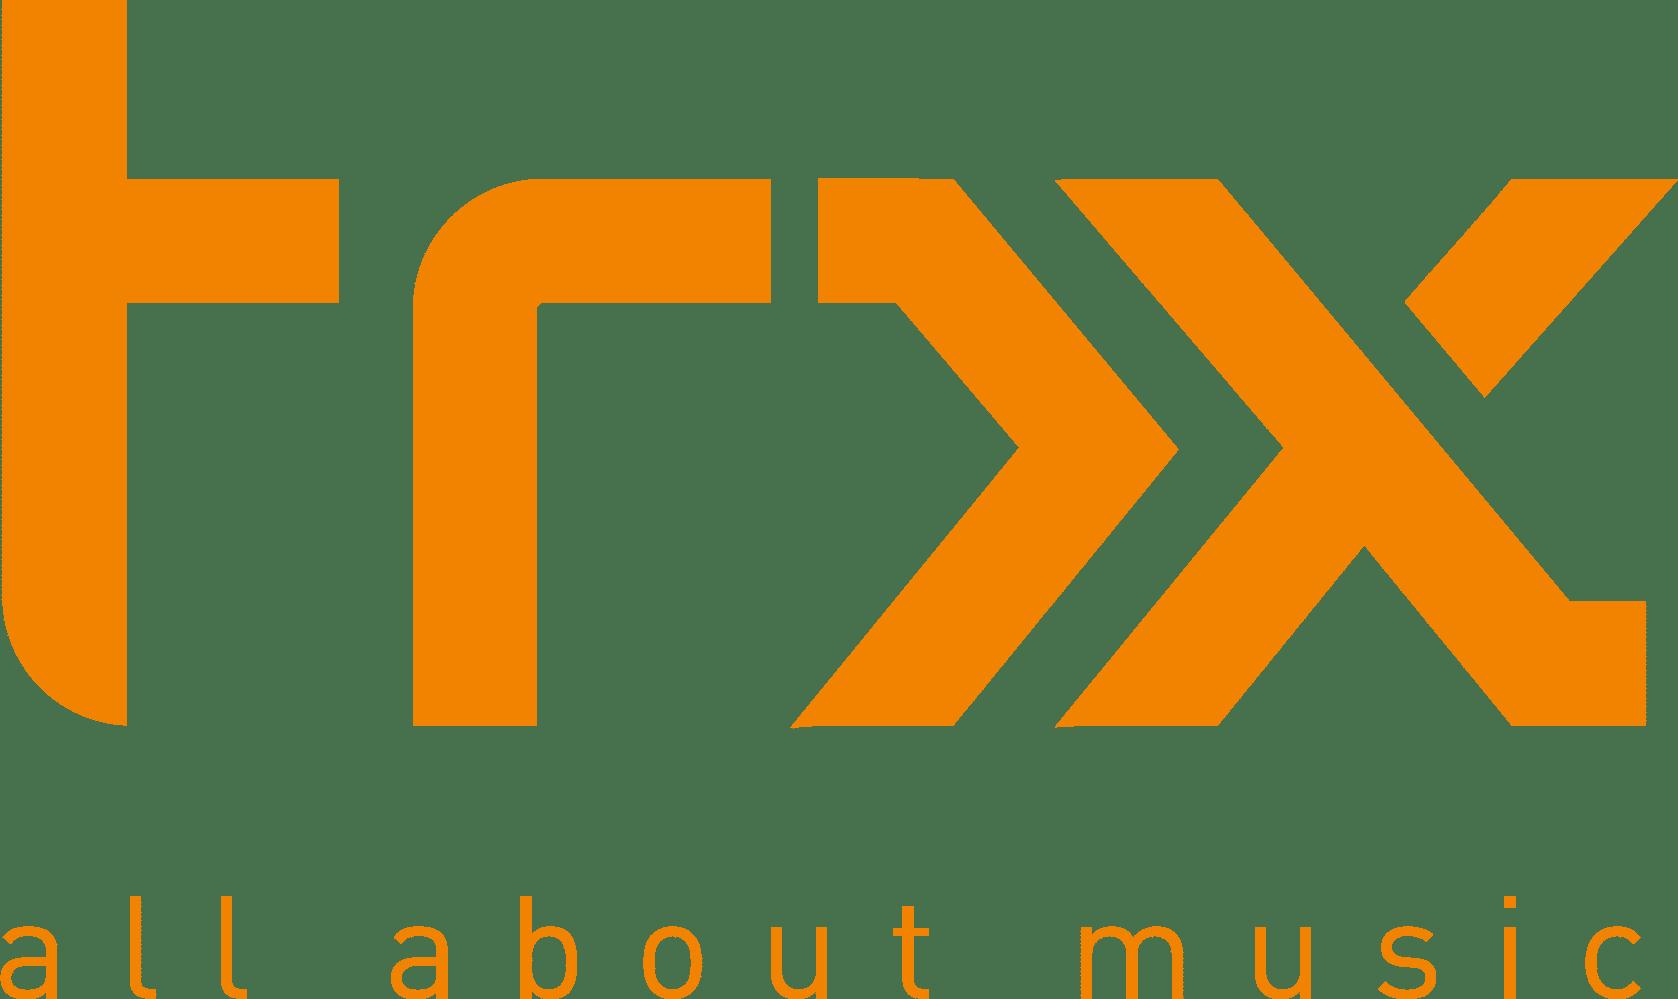 TRX Music